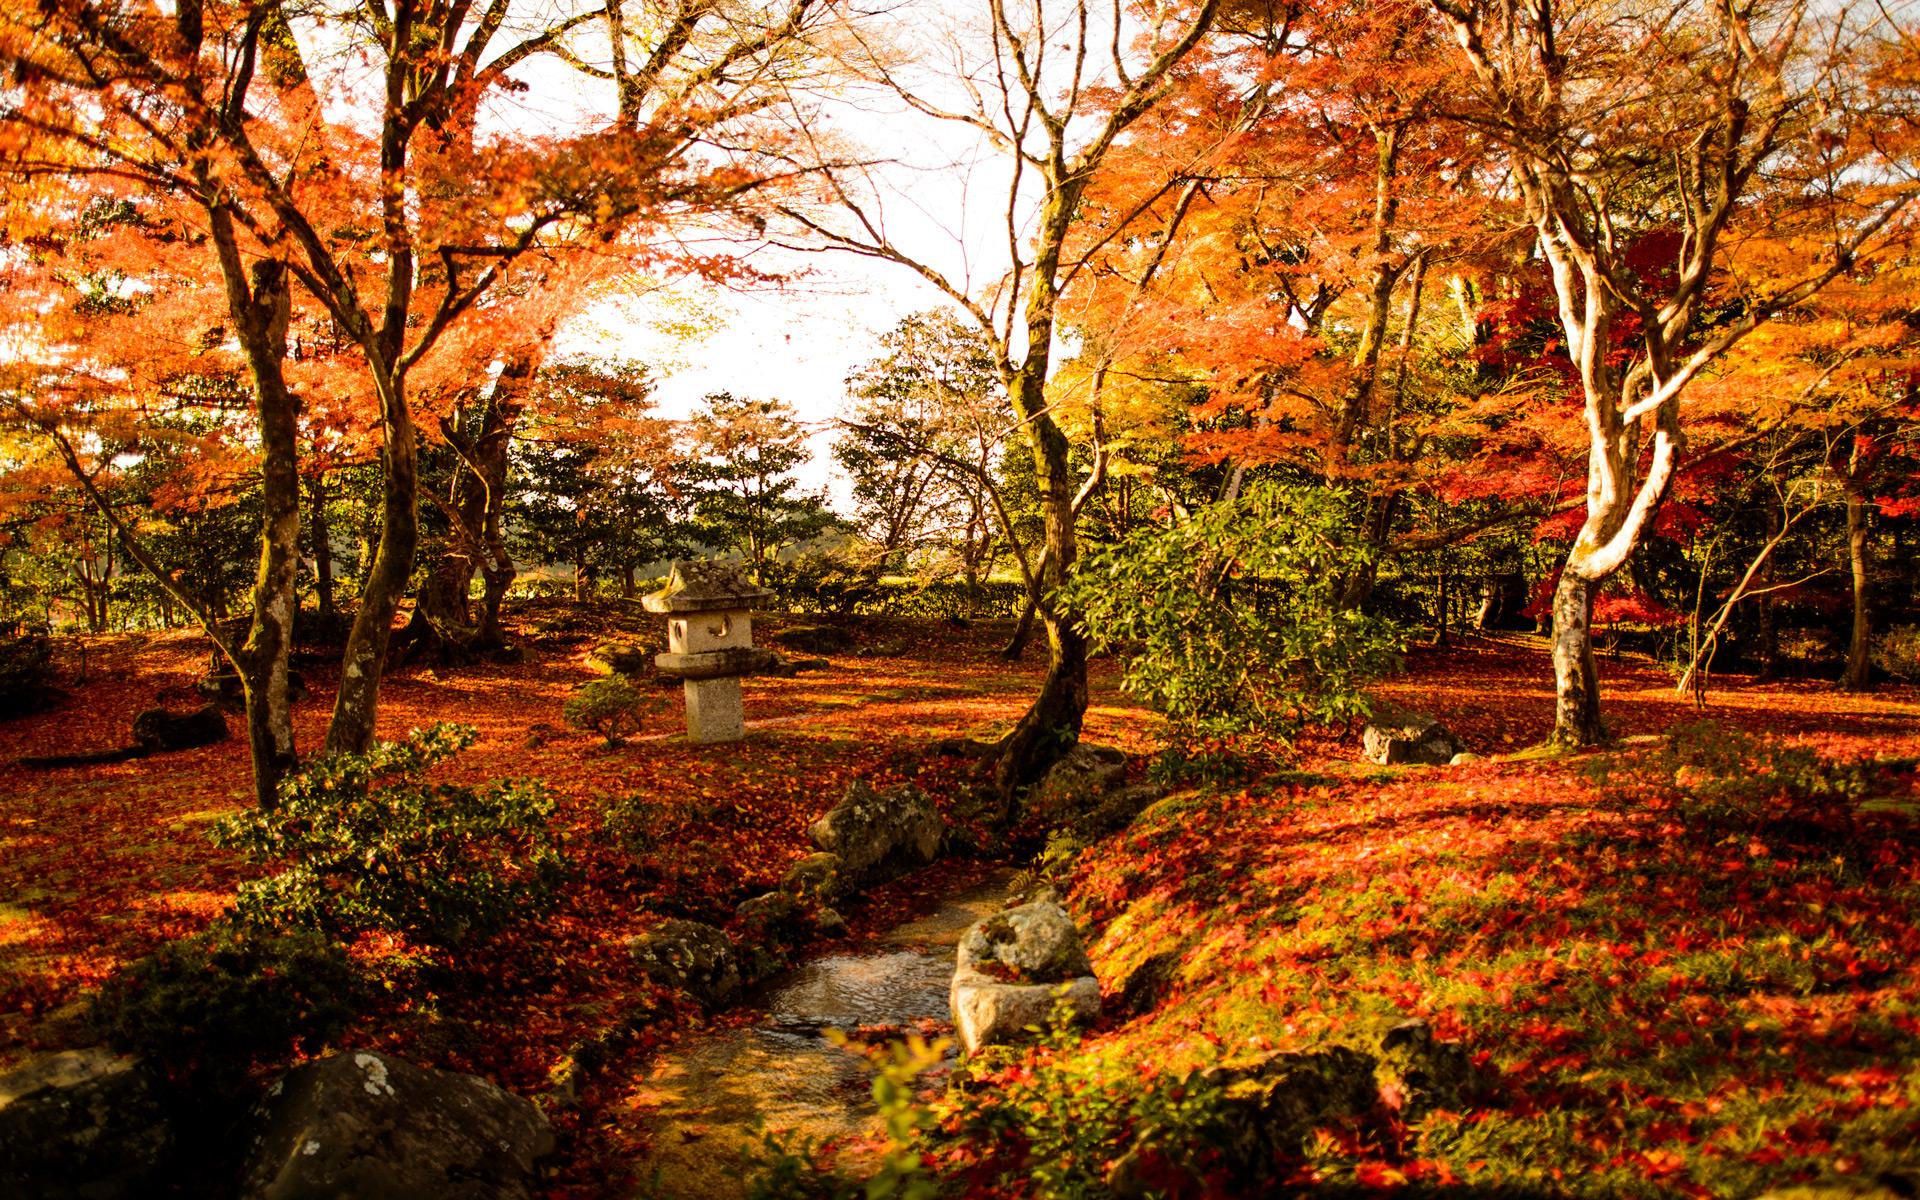 Fall Scenes Desktop Wallpaper Jeffrey Friedl S Blog 187 My First Visit To Kyoto S